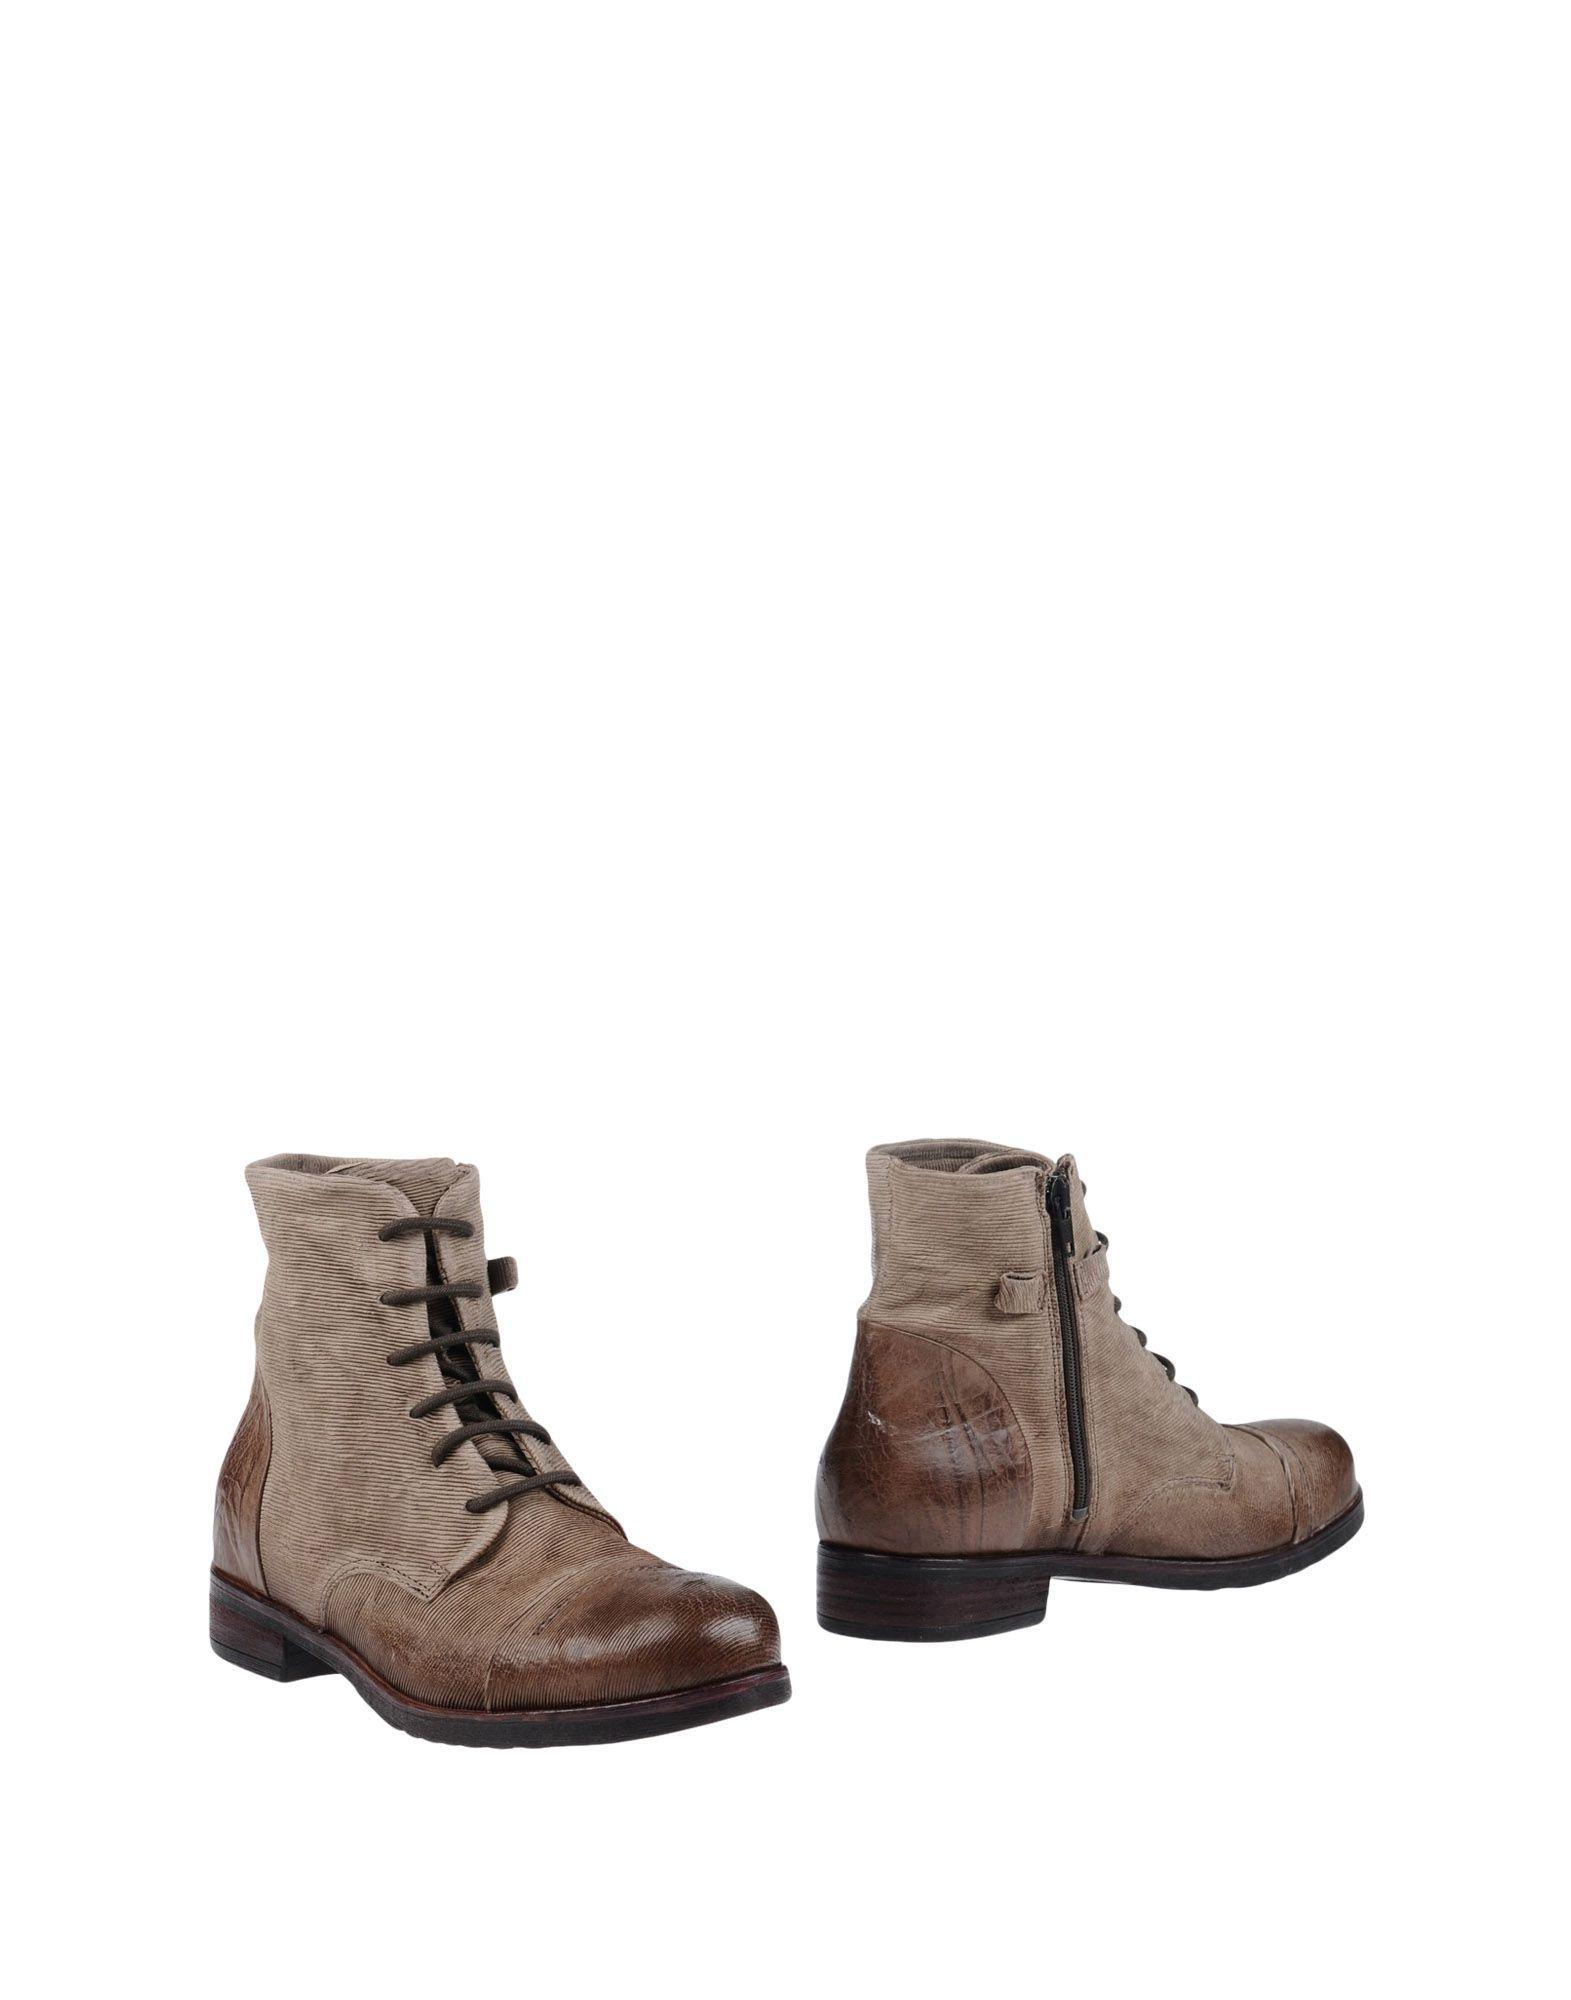 Stilvolle billige Schuhe Damen Fabbrica Deicolli Stiefelette Damen Schuhe  11255029CG 373d44